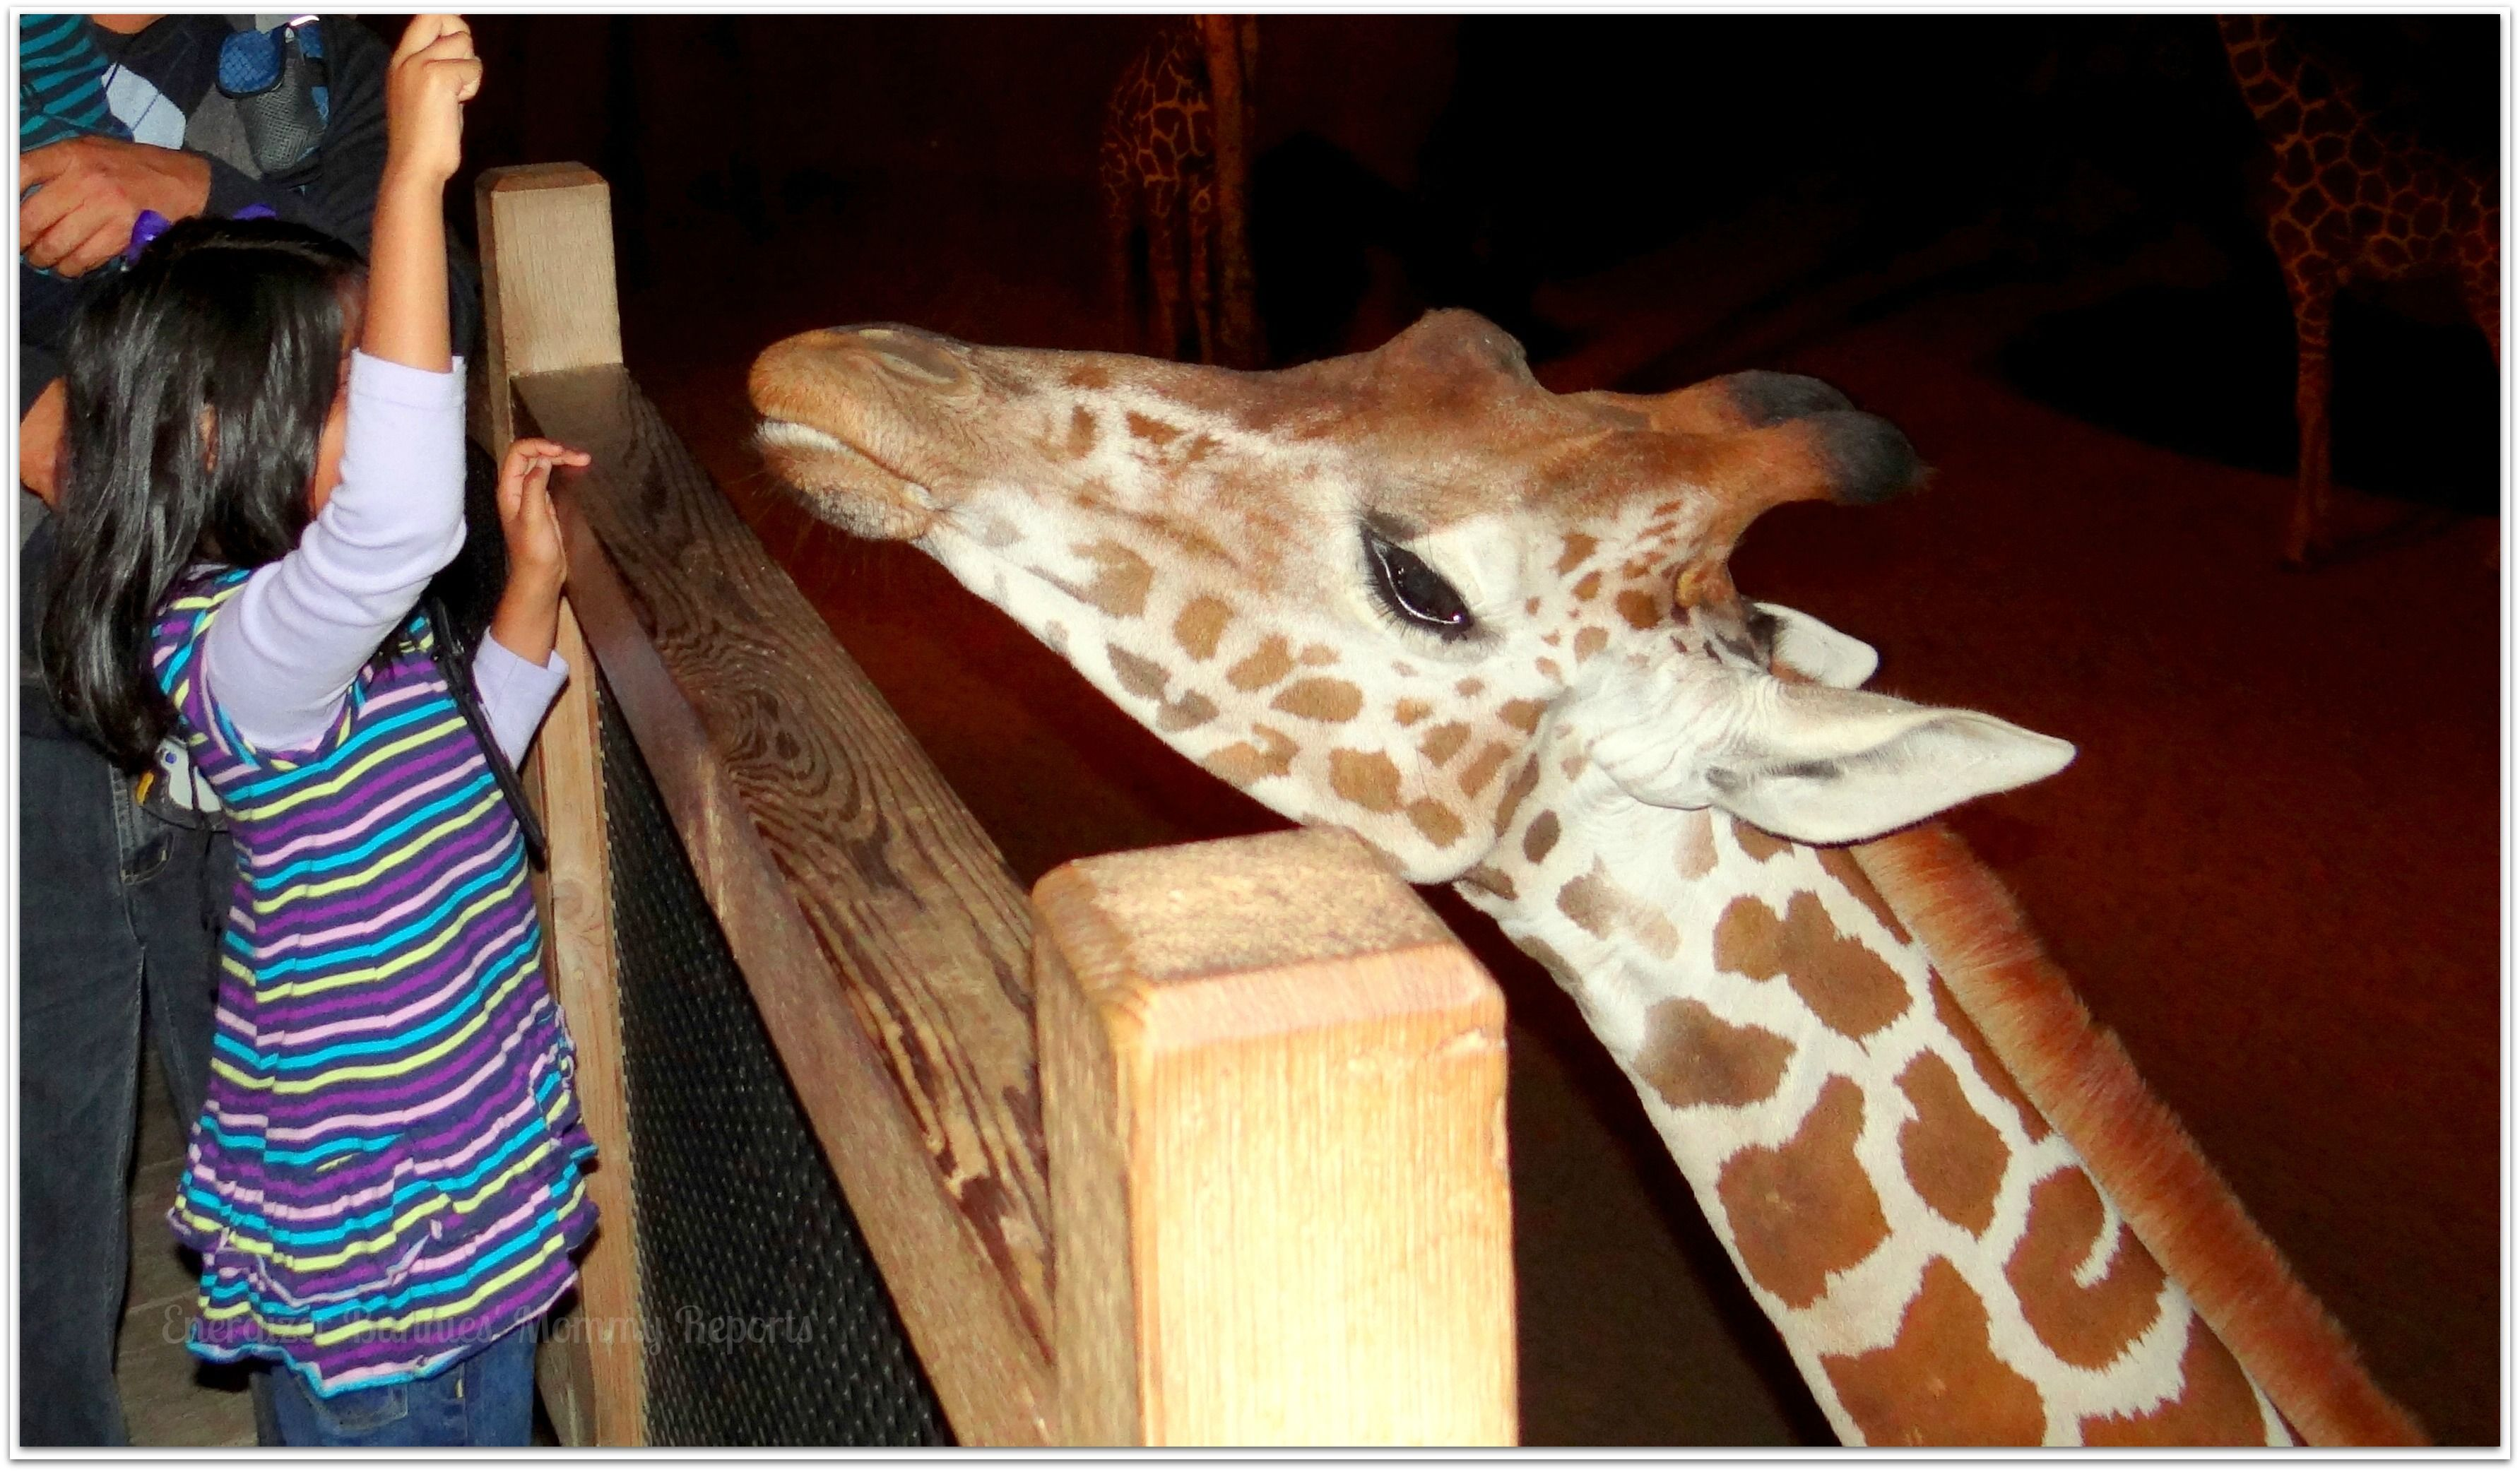 Giraffe Feeding Enclosure At The Dallas Zoo Dallas Zoo Giraffe Feeding Giraffe